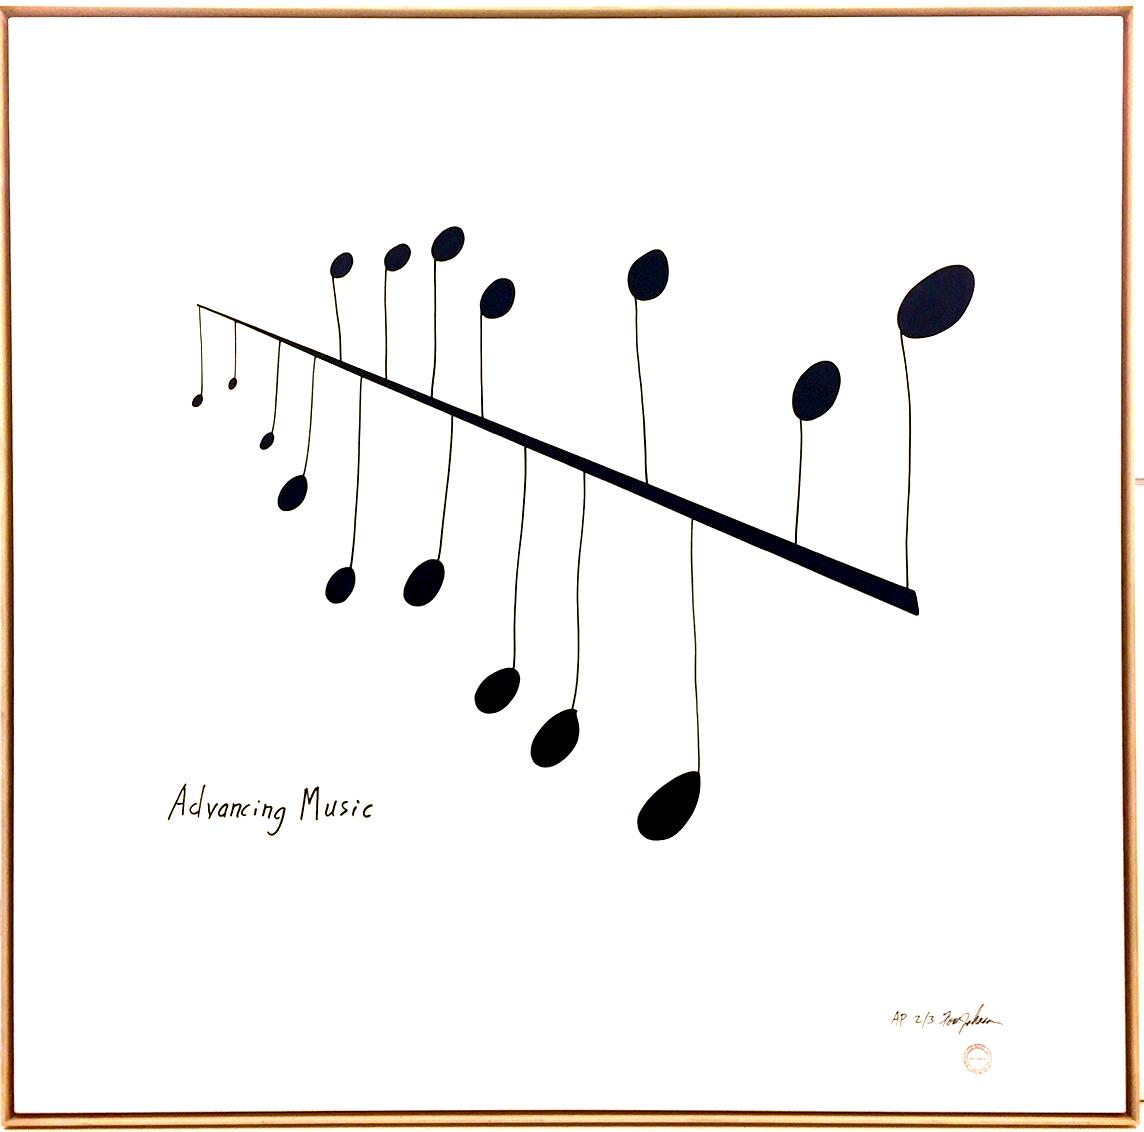 Tom Johnson - Advancing Music